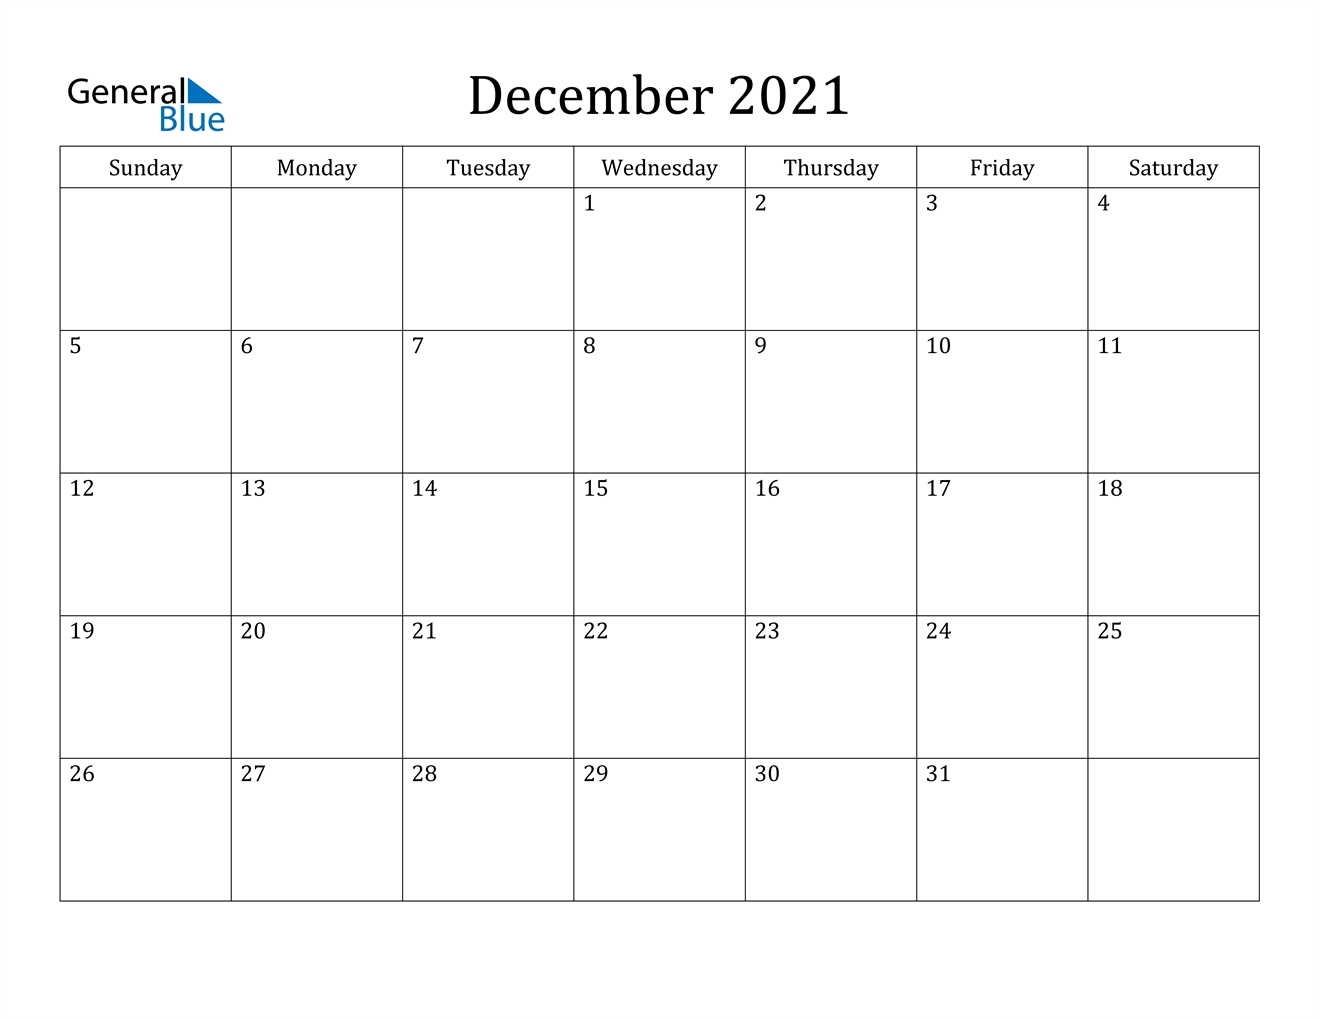 Get Decembers Calender For 2021